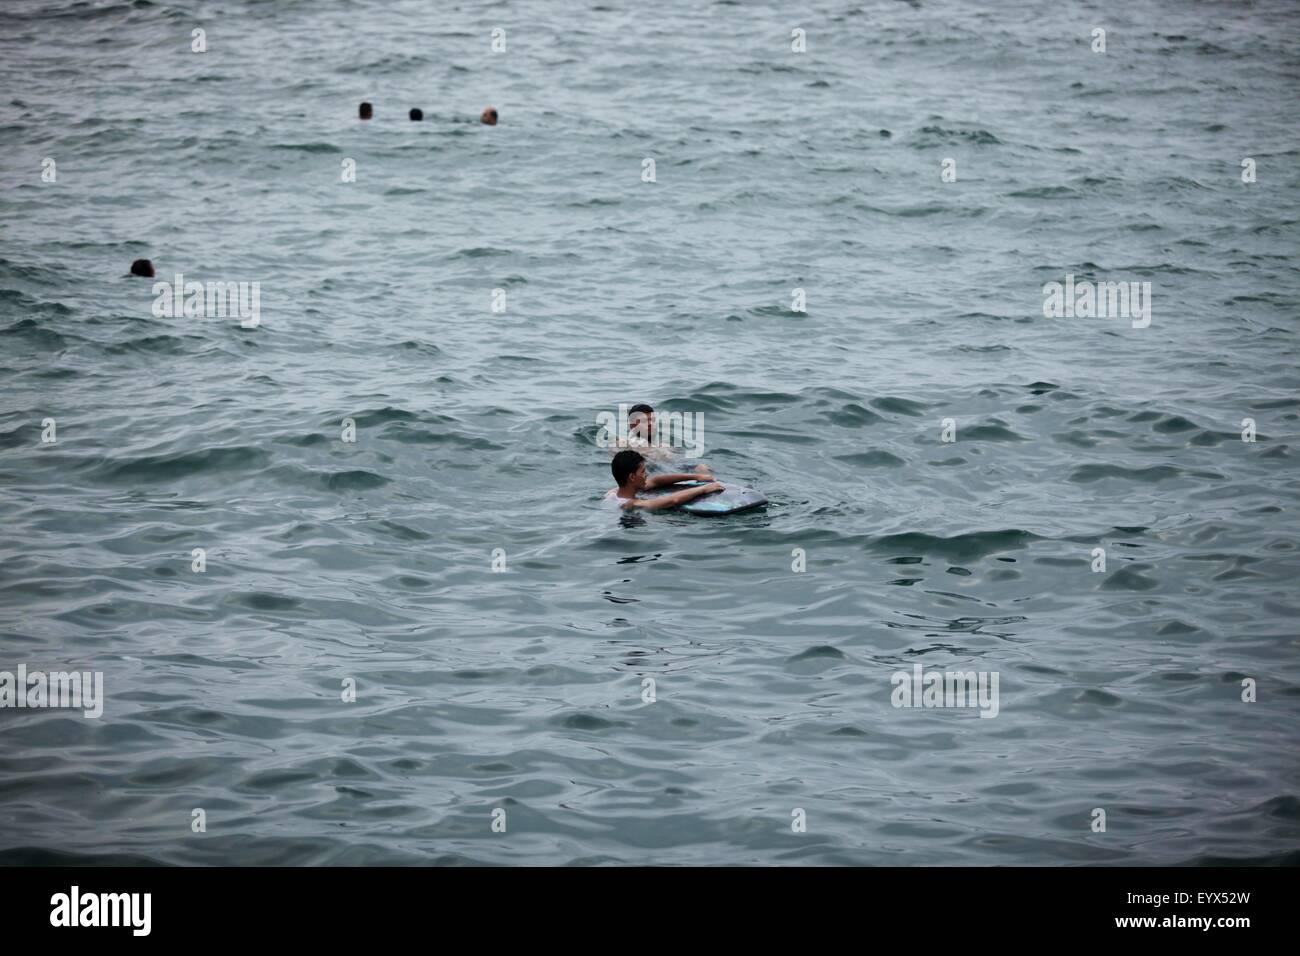 Gaza City, Gaza Strip, Palestinian Territory. 4th Aug, 2015. Palestinians swim in the Mediterranean Sea on the coast - Stock Image